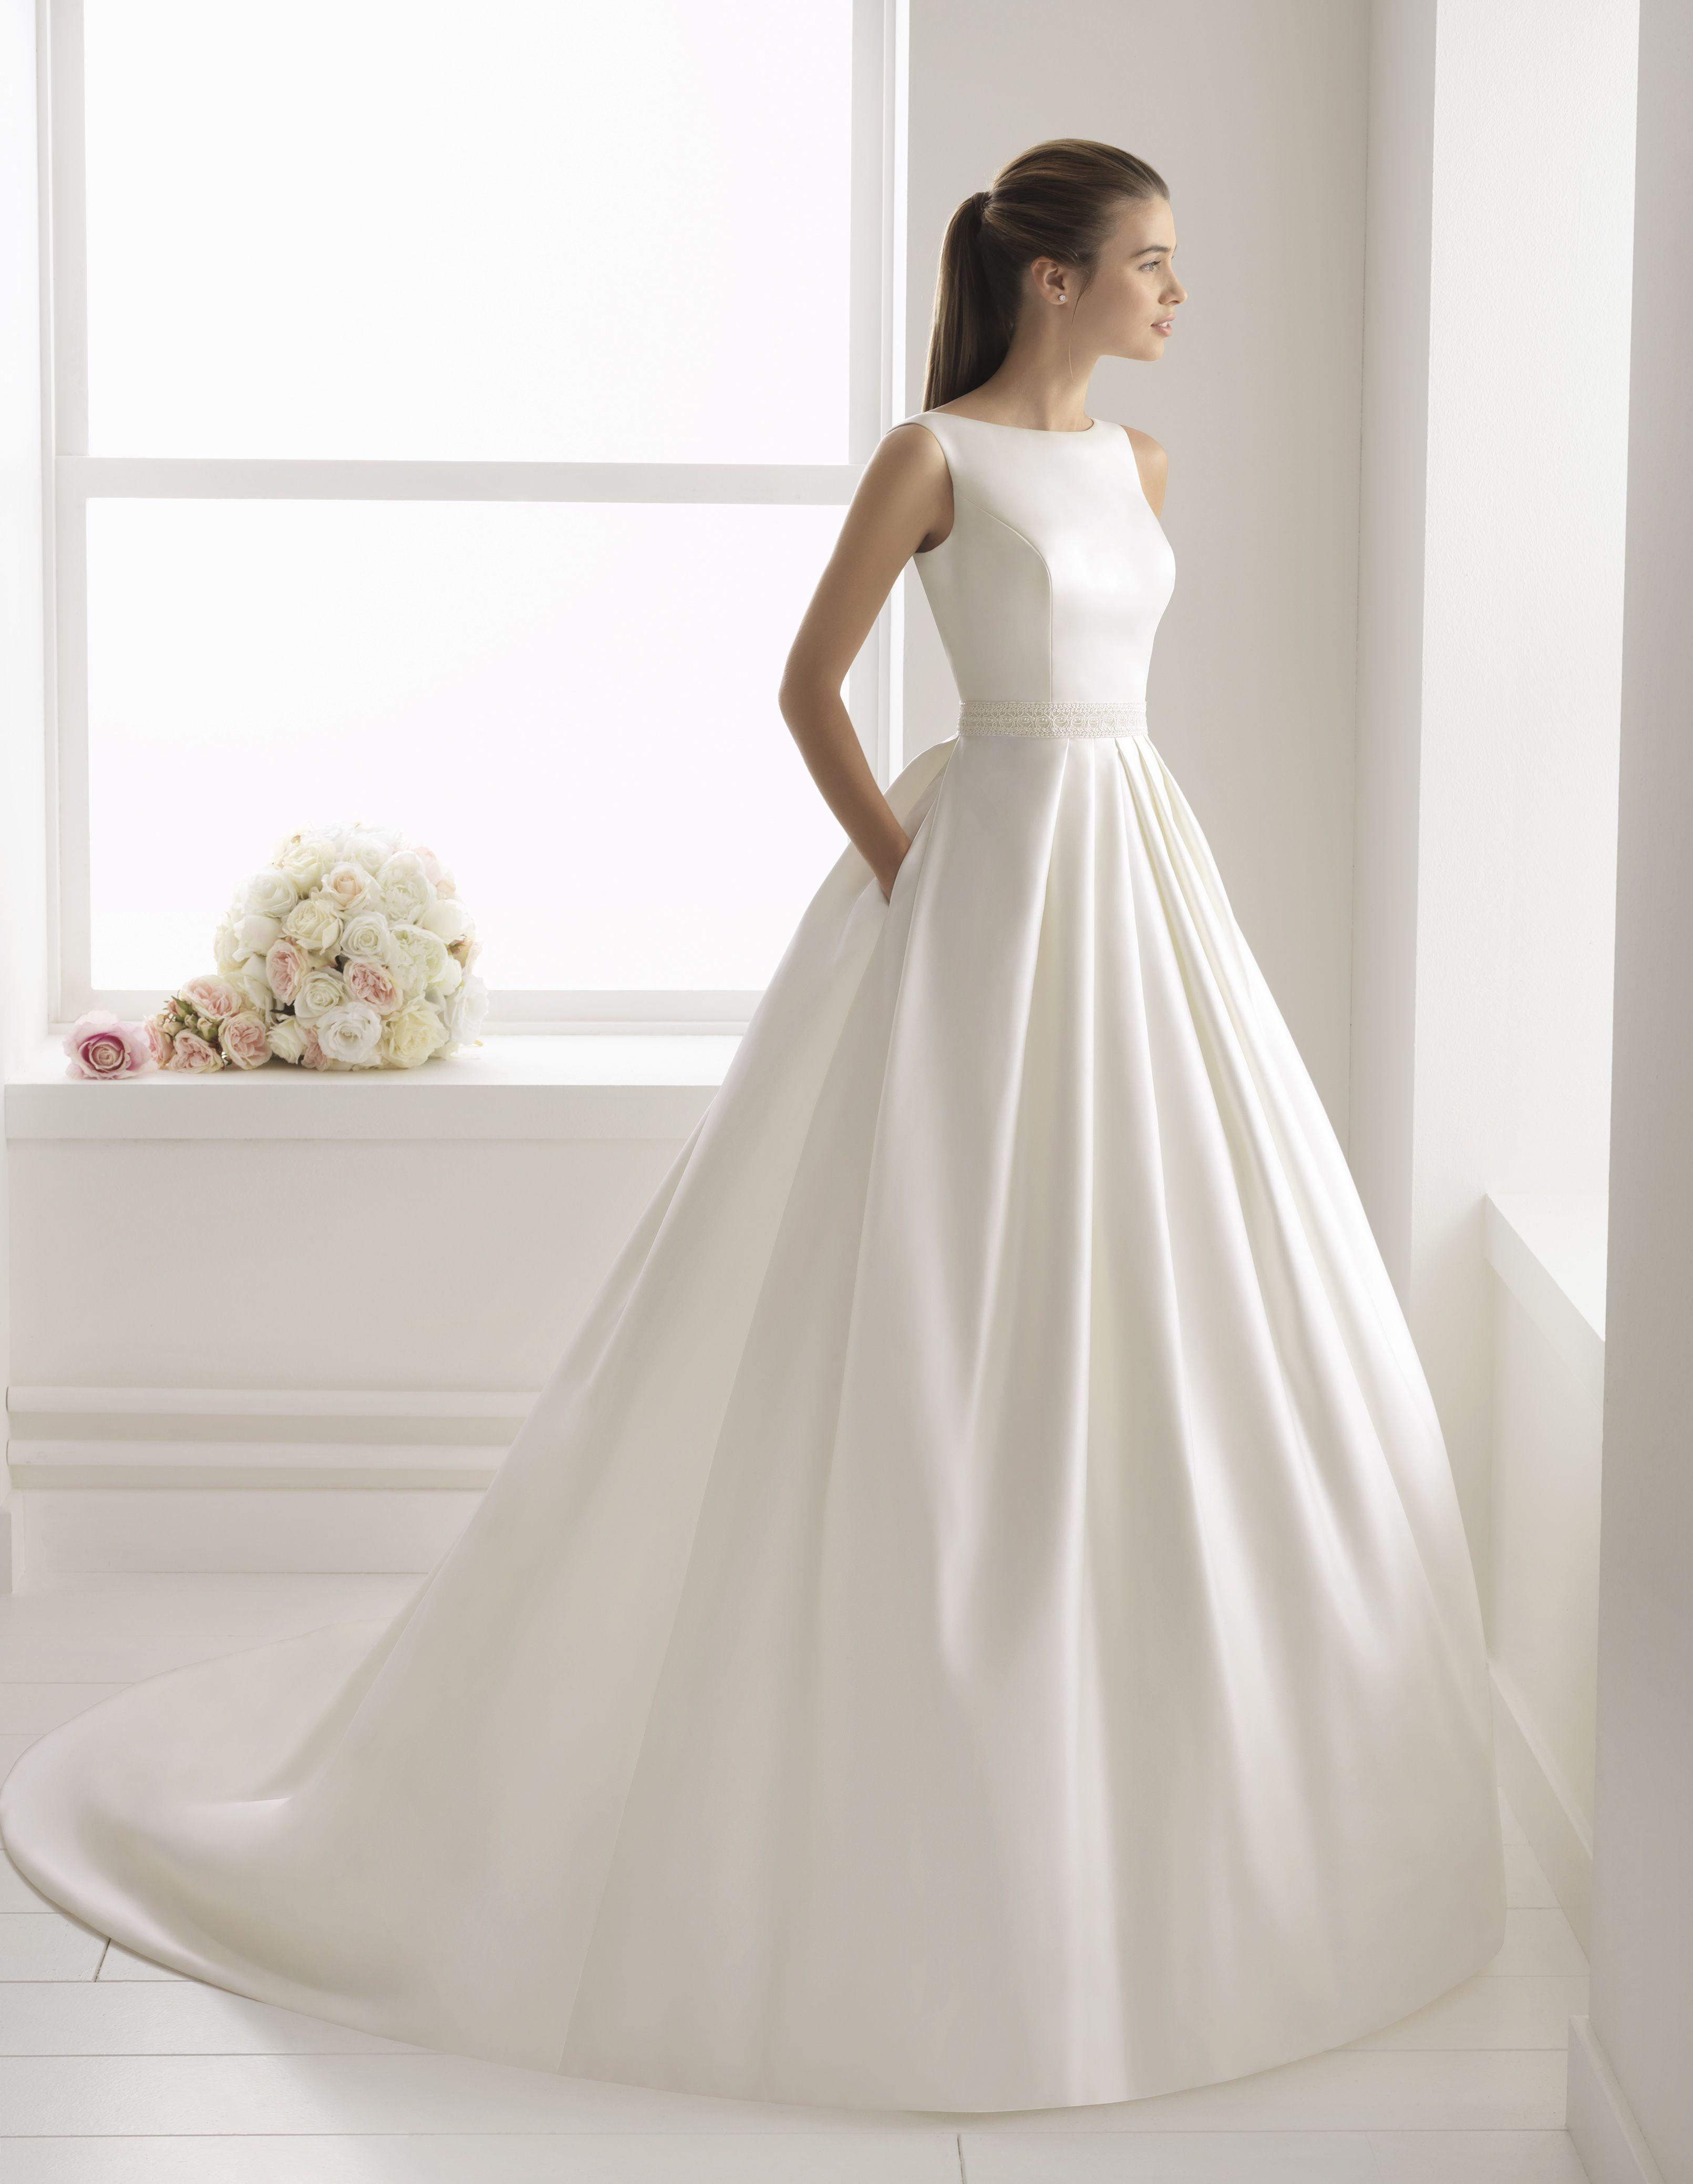 b0b0f47bf18 Robe Bliss  collection 2018  airebarcelona !  robesdemariee  robes  wedding   weddingdress  dress  bridal  mariée  mariage